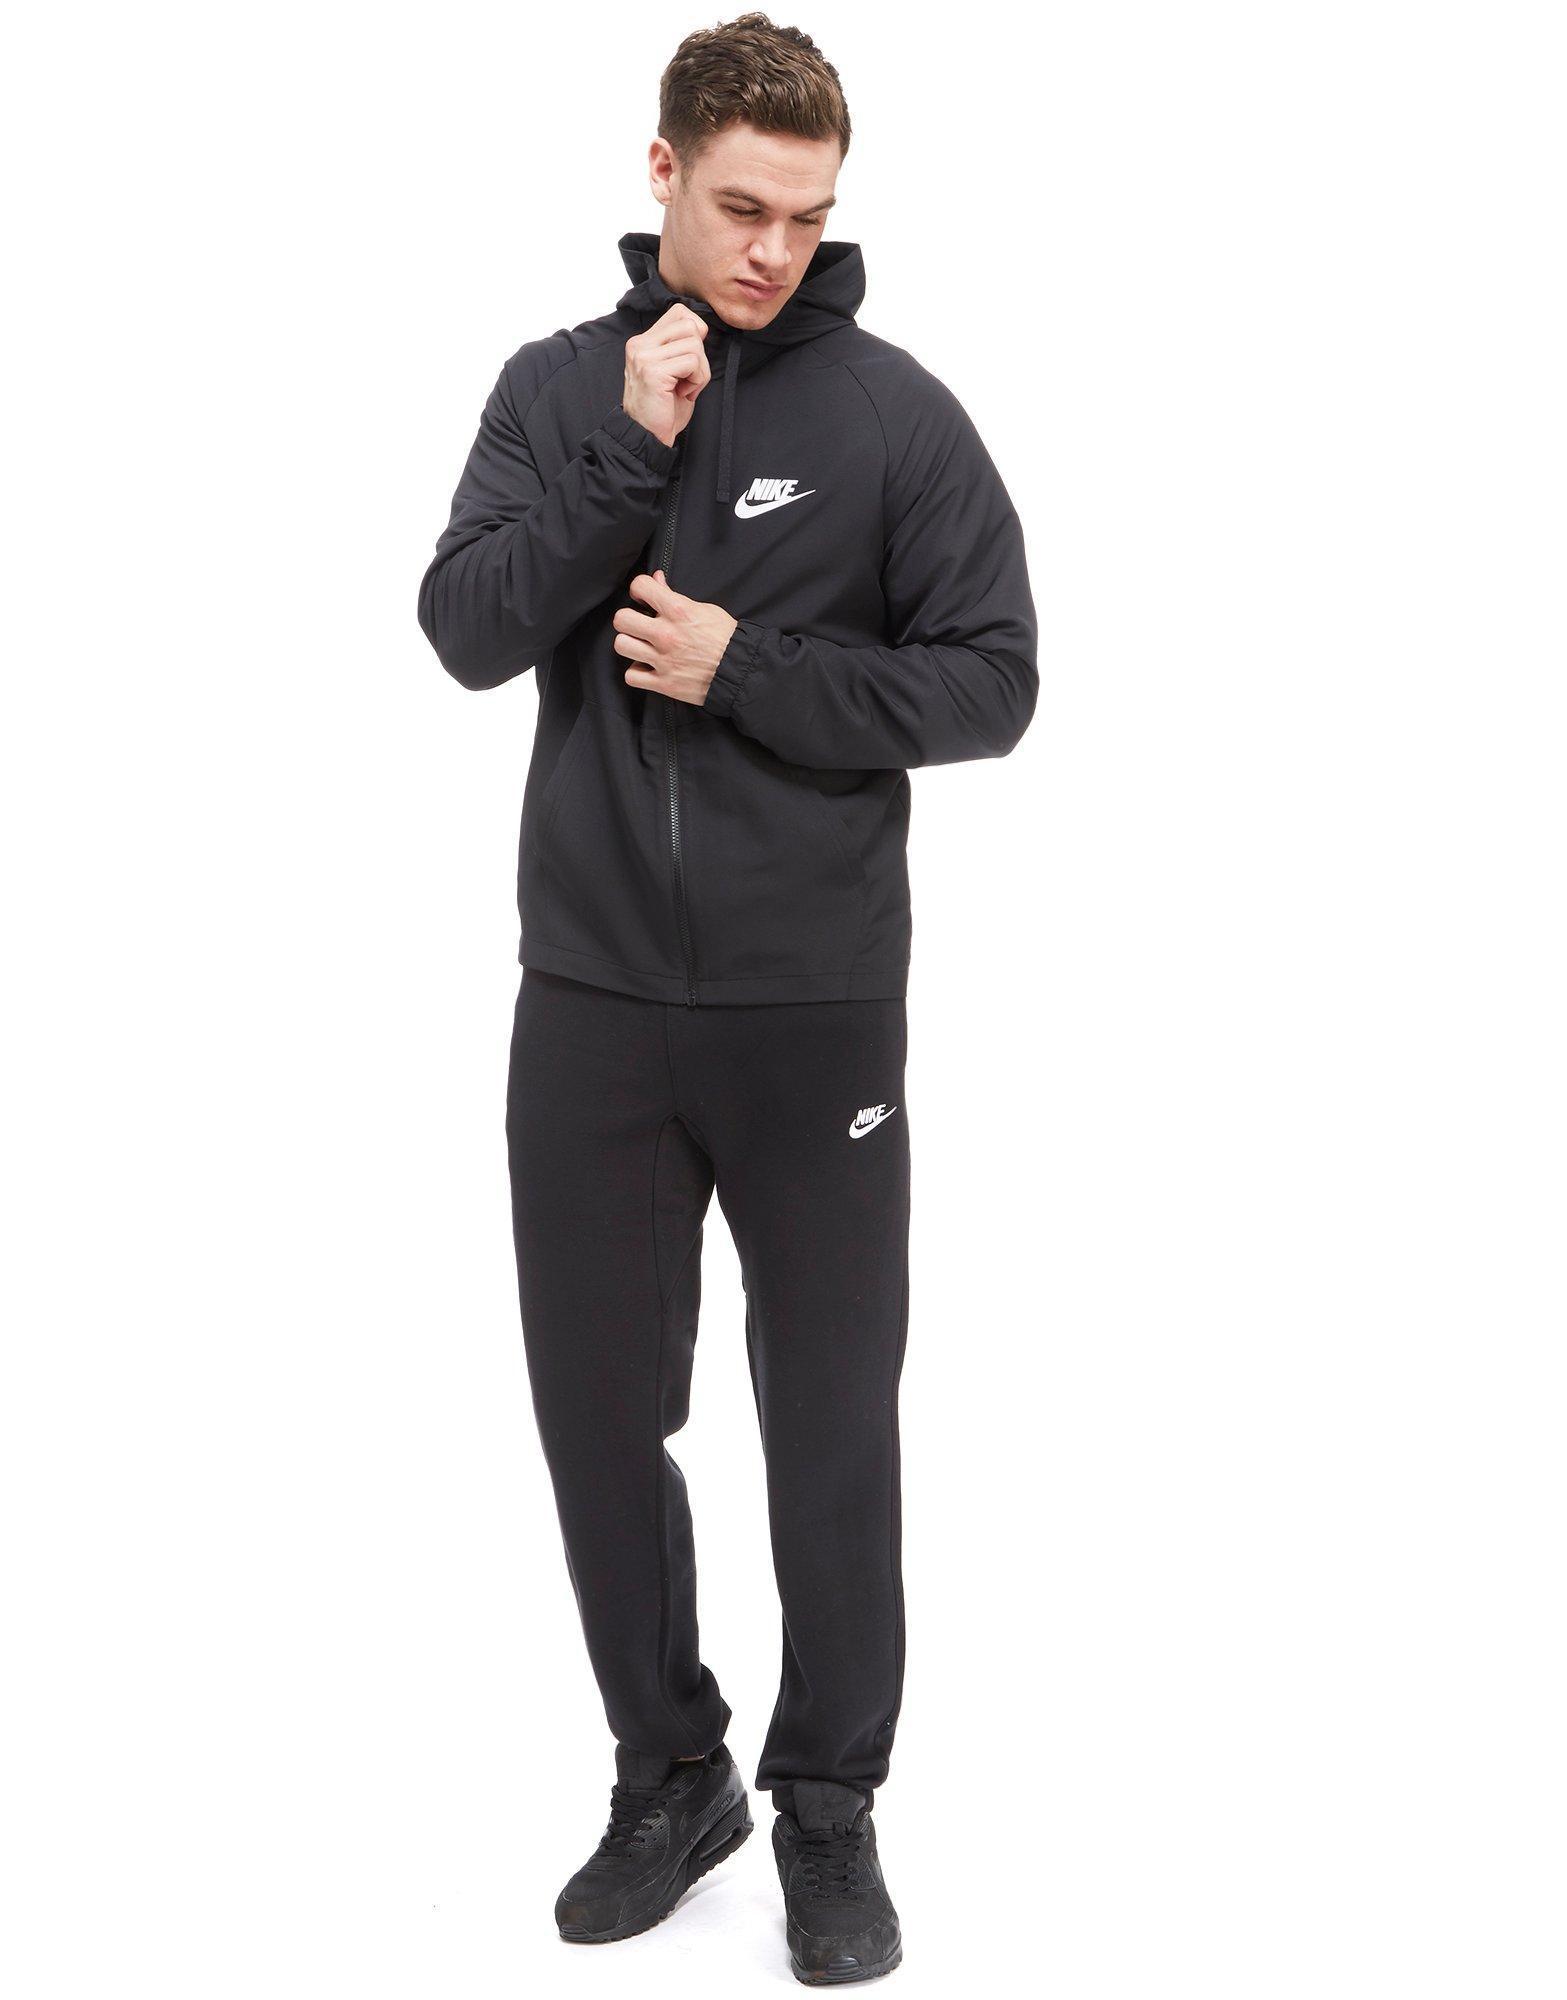 93086ef4eaa2 Nike Shut Out 2 Woven Hoody in Black for Men - Lyst